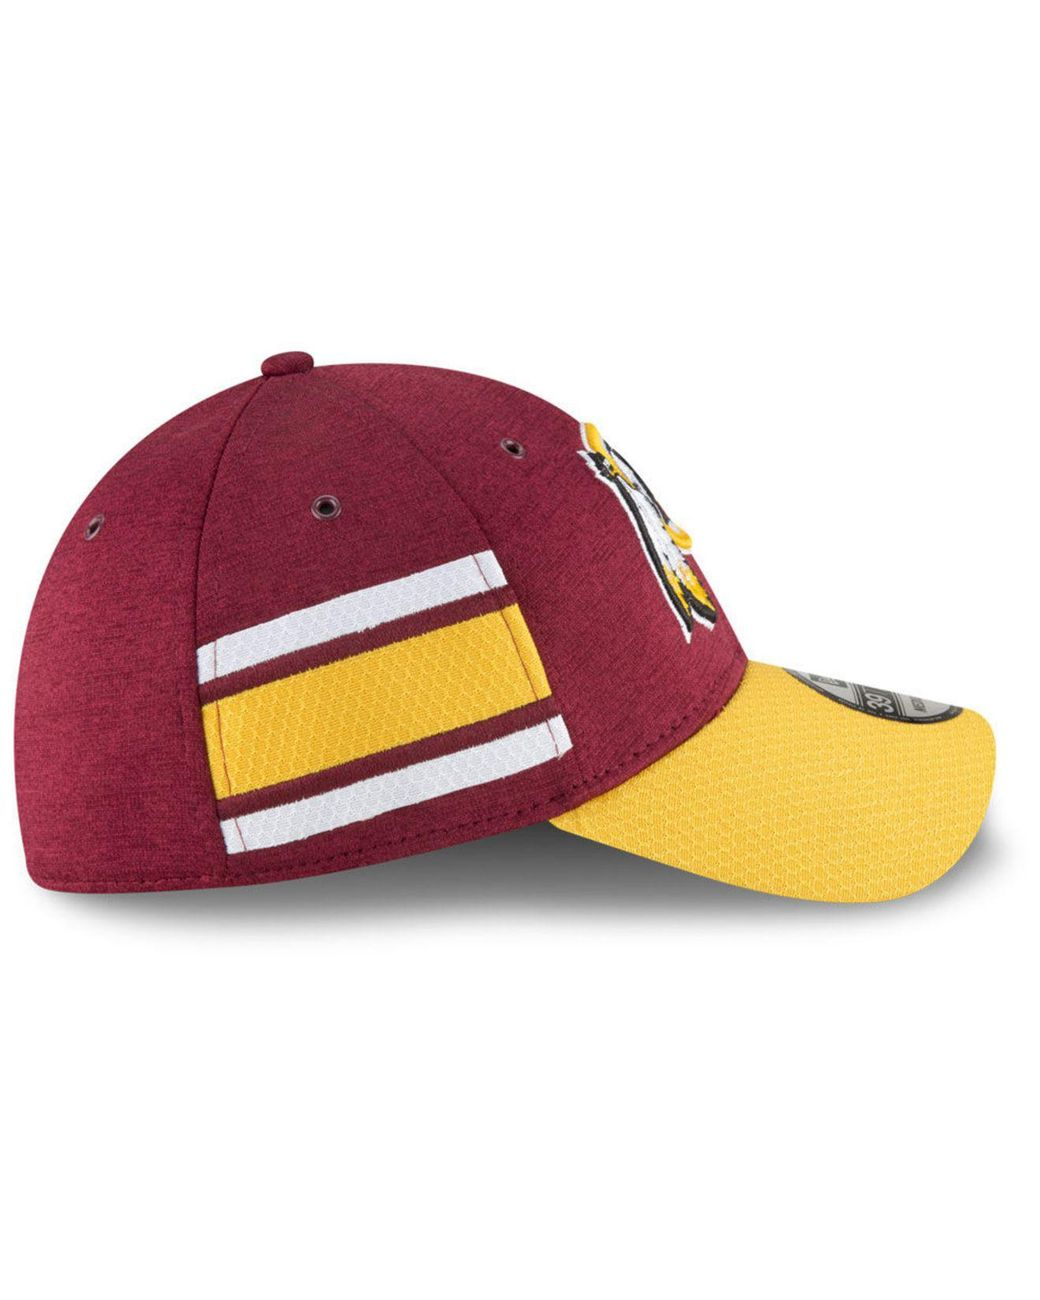 best website aaf5e 1b6a6 KTZ Washington Redskins On Field Sideline Home 39thirty Cap for Men - Save  25% - Lyst